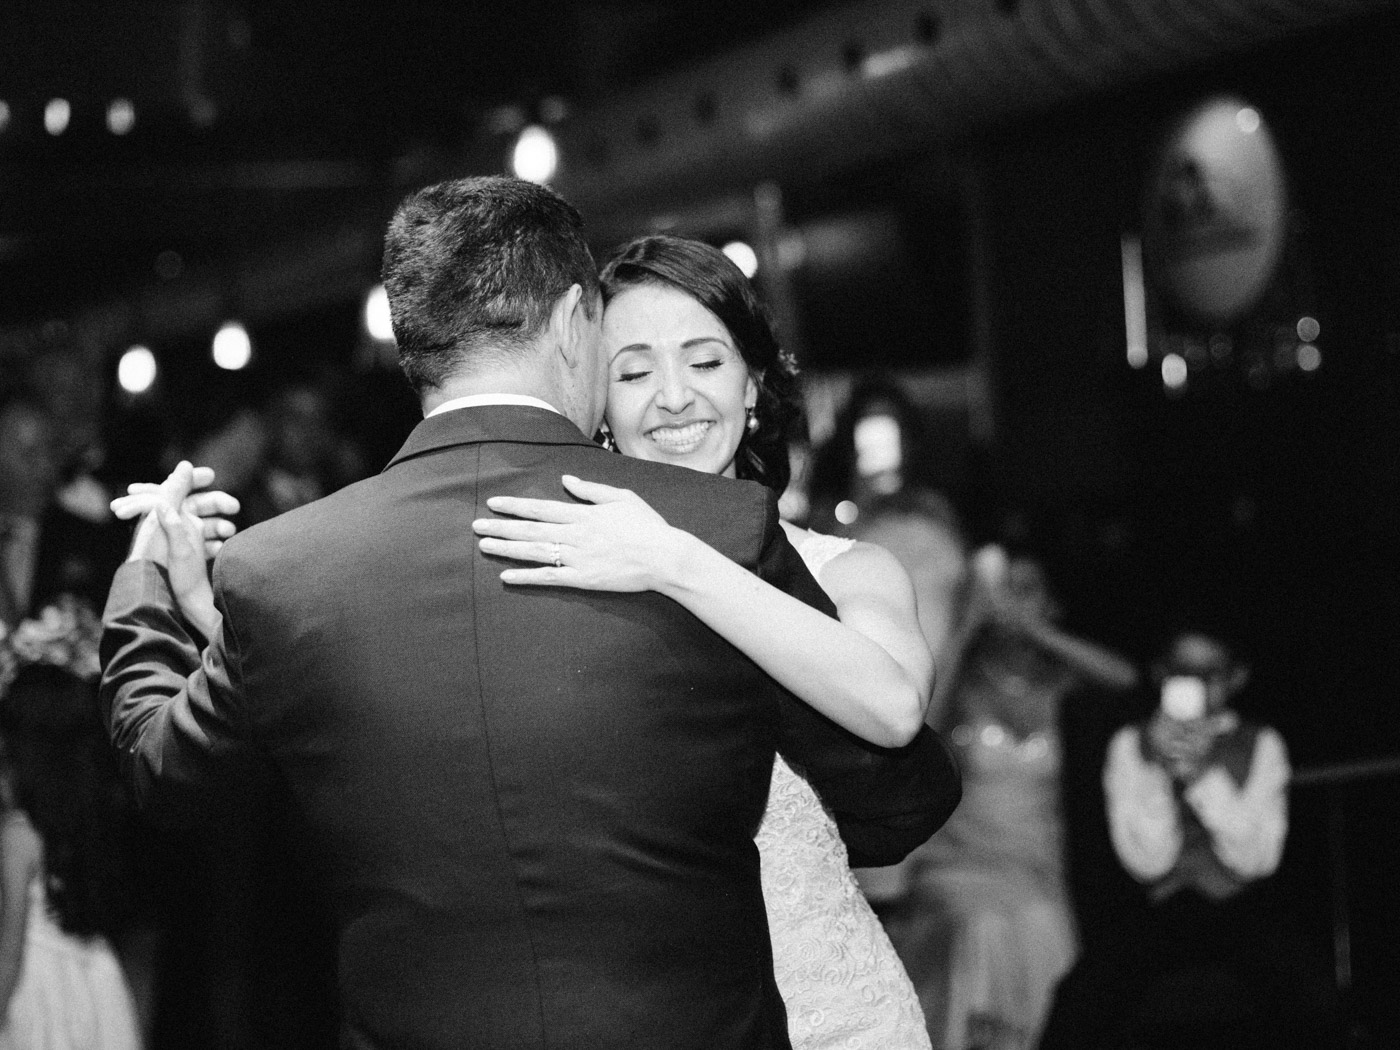 toronto_wedding_photographer_fine_art_documentary-547.jpg